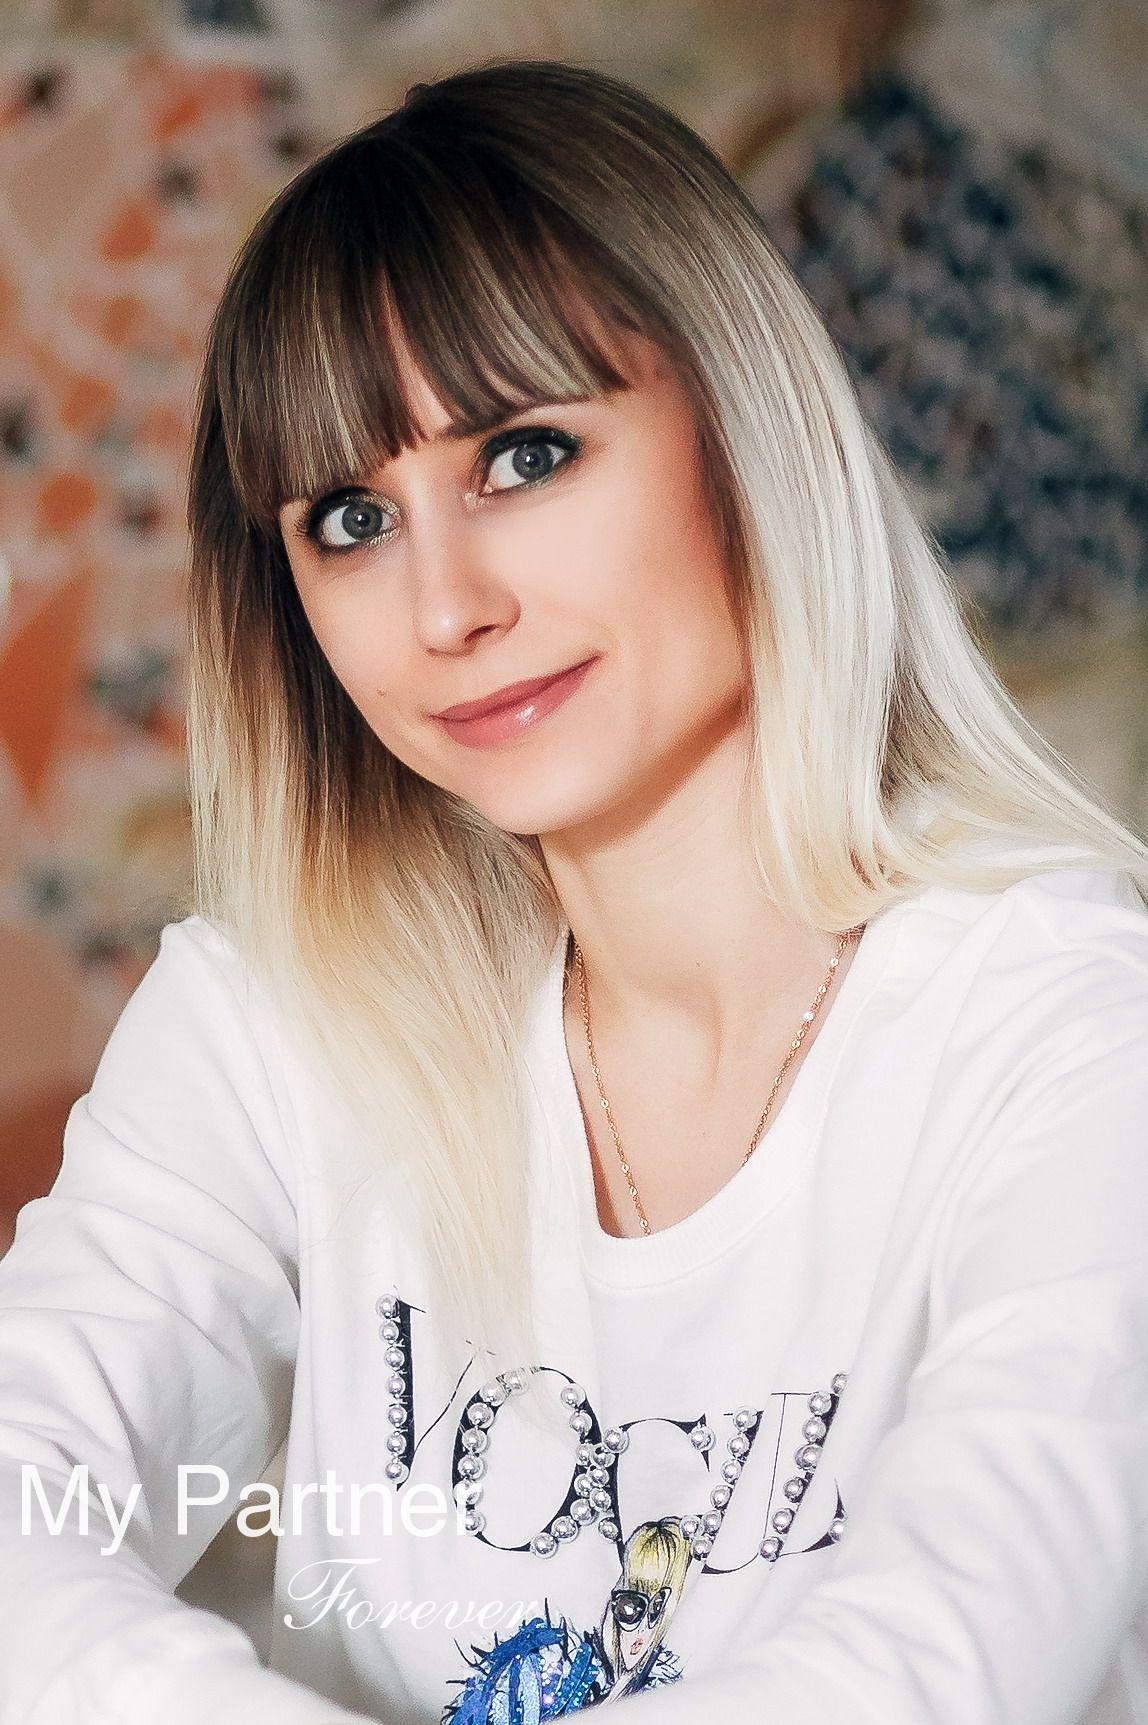 Charming Belarusian Woman Lyudmila from Grodno, Belarus